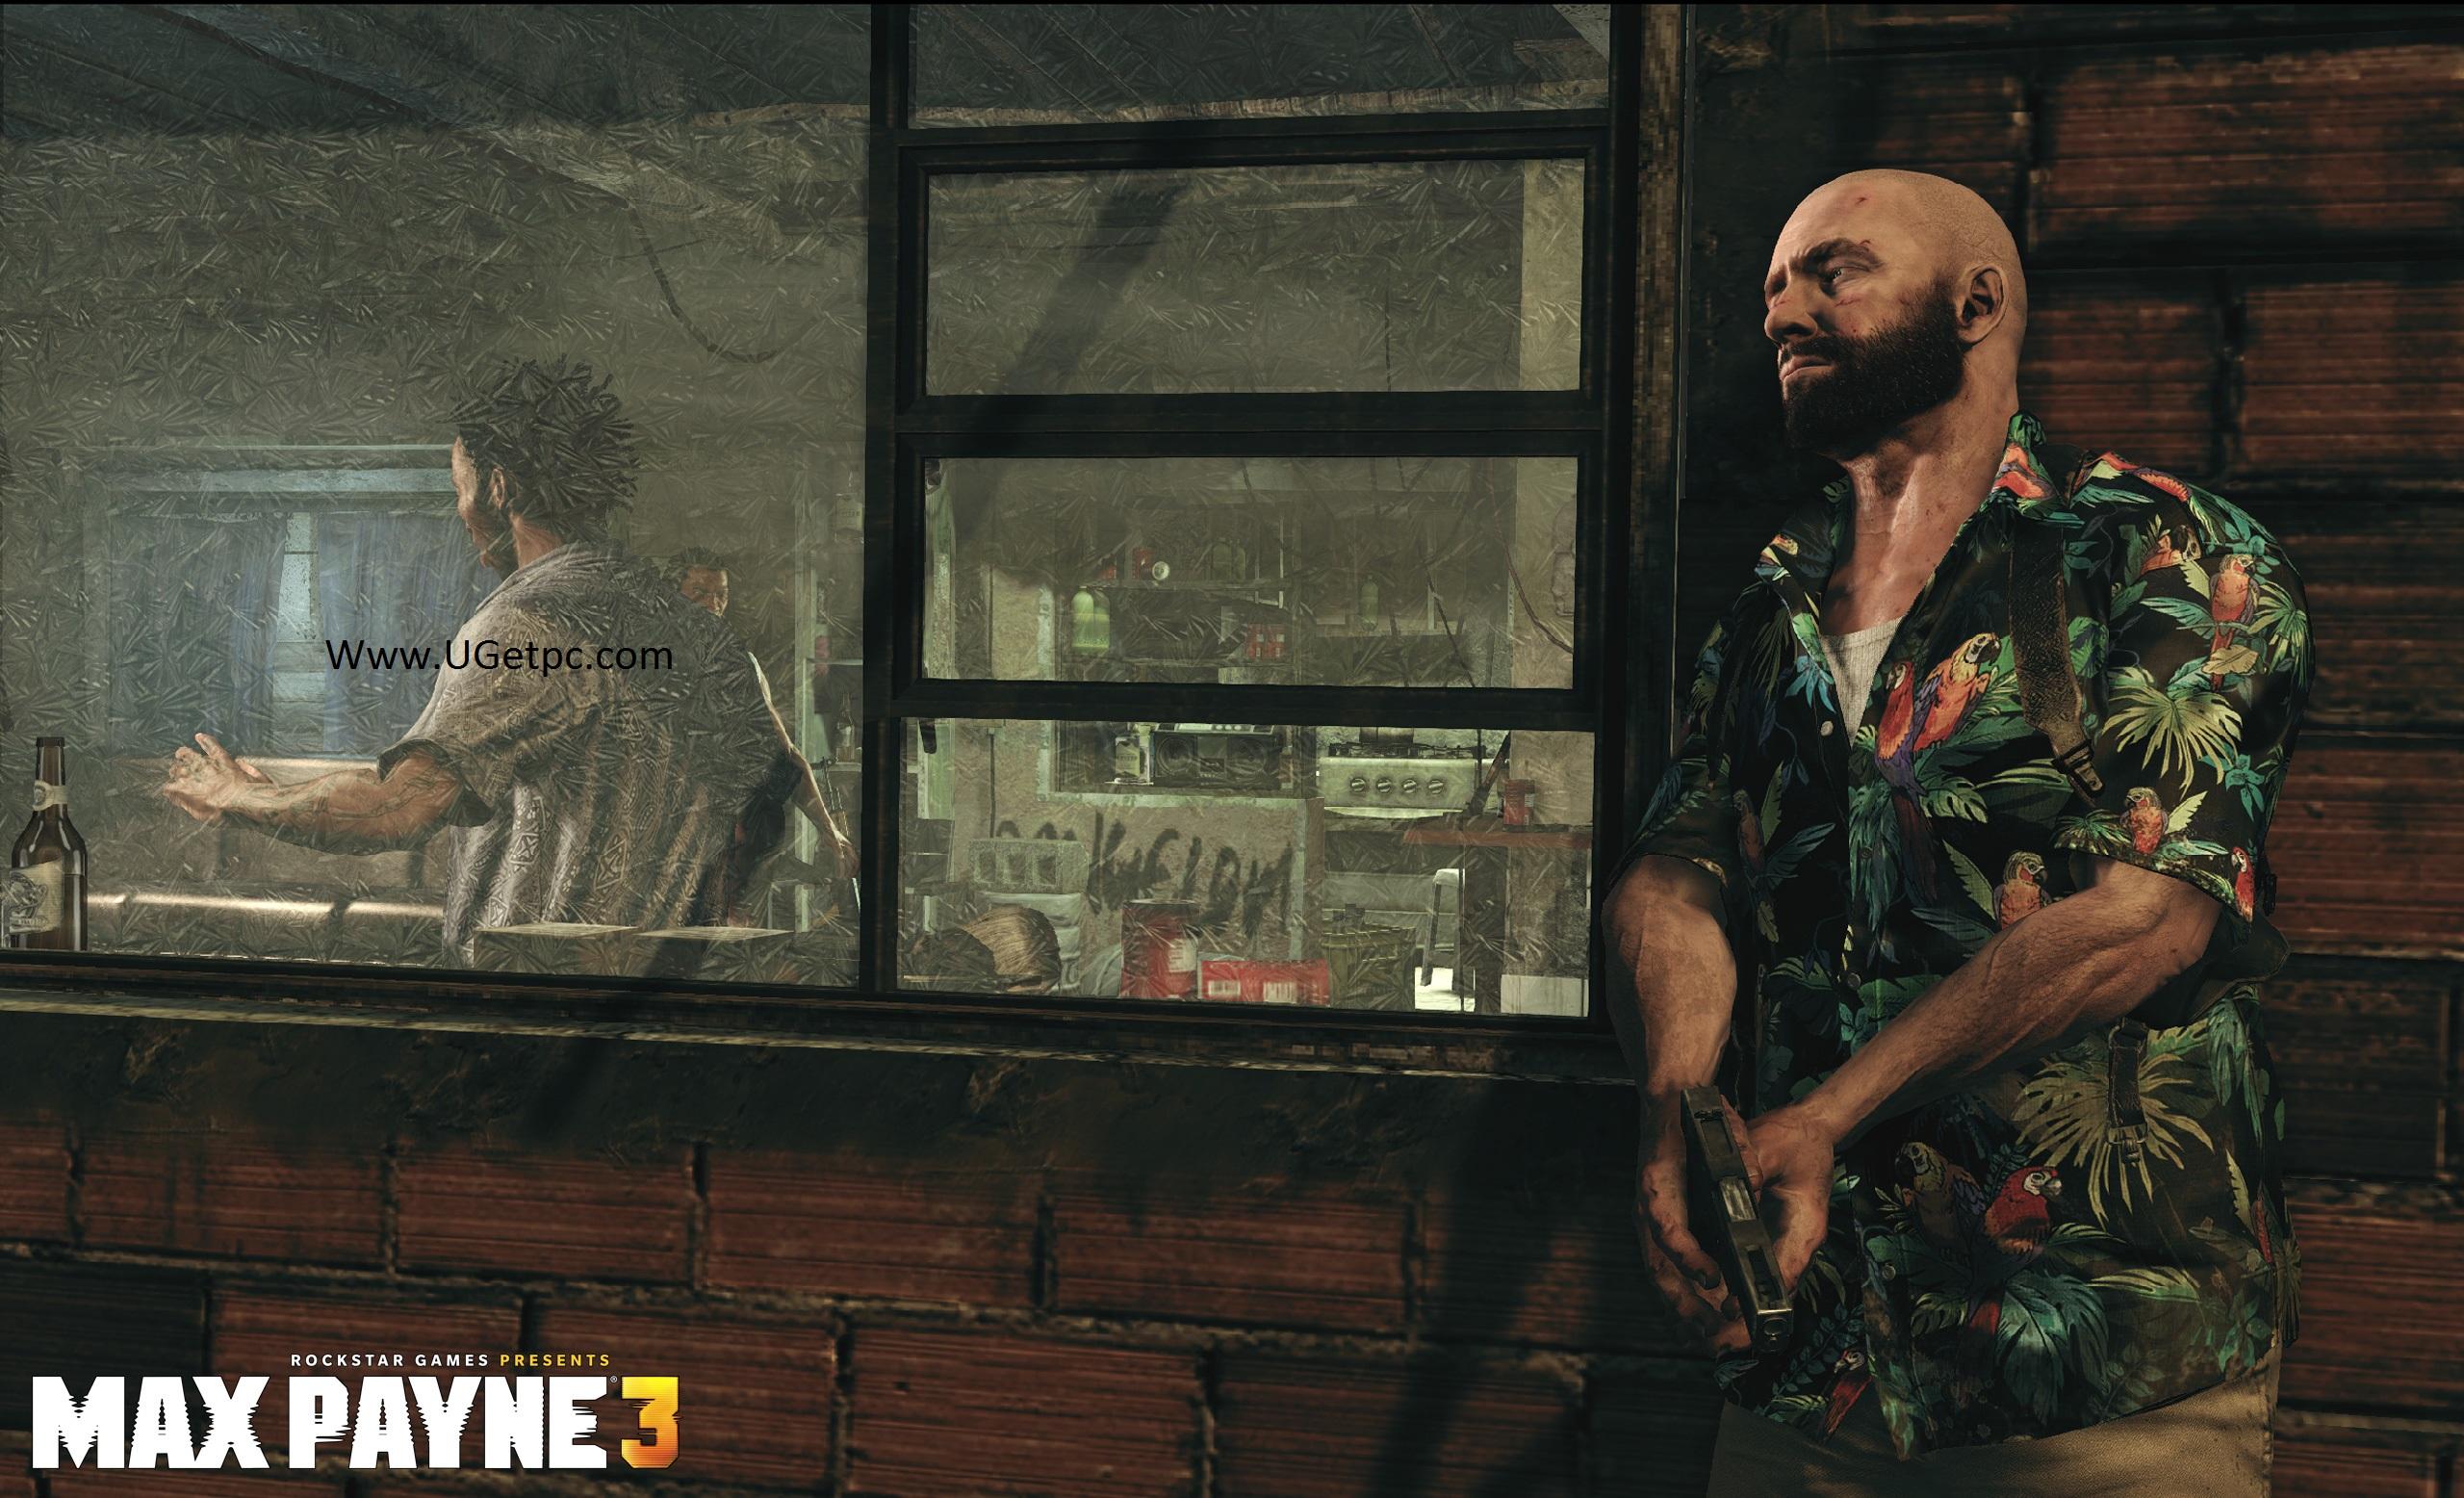 Max-Payne-3-cod-UGetpc